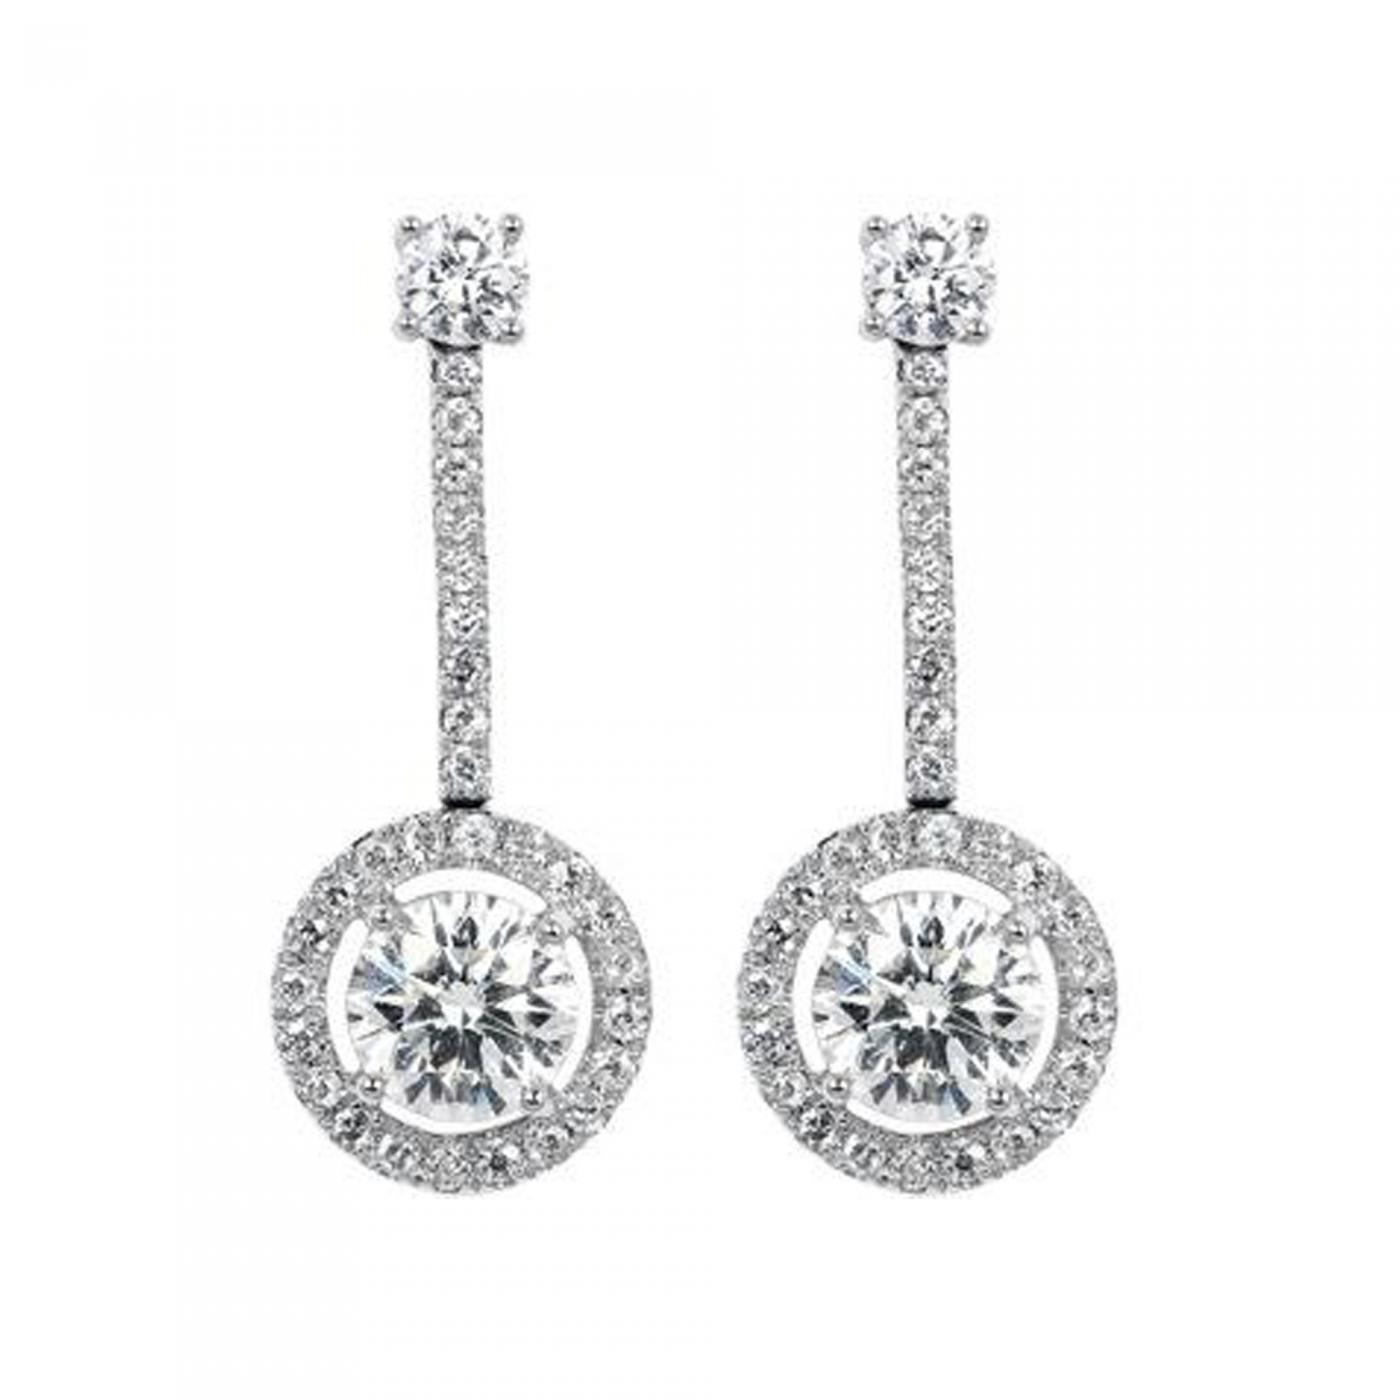 Tiffany & Co 1 85ct Tiffany & Co Diamond Drop Estate Earrings